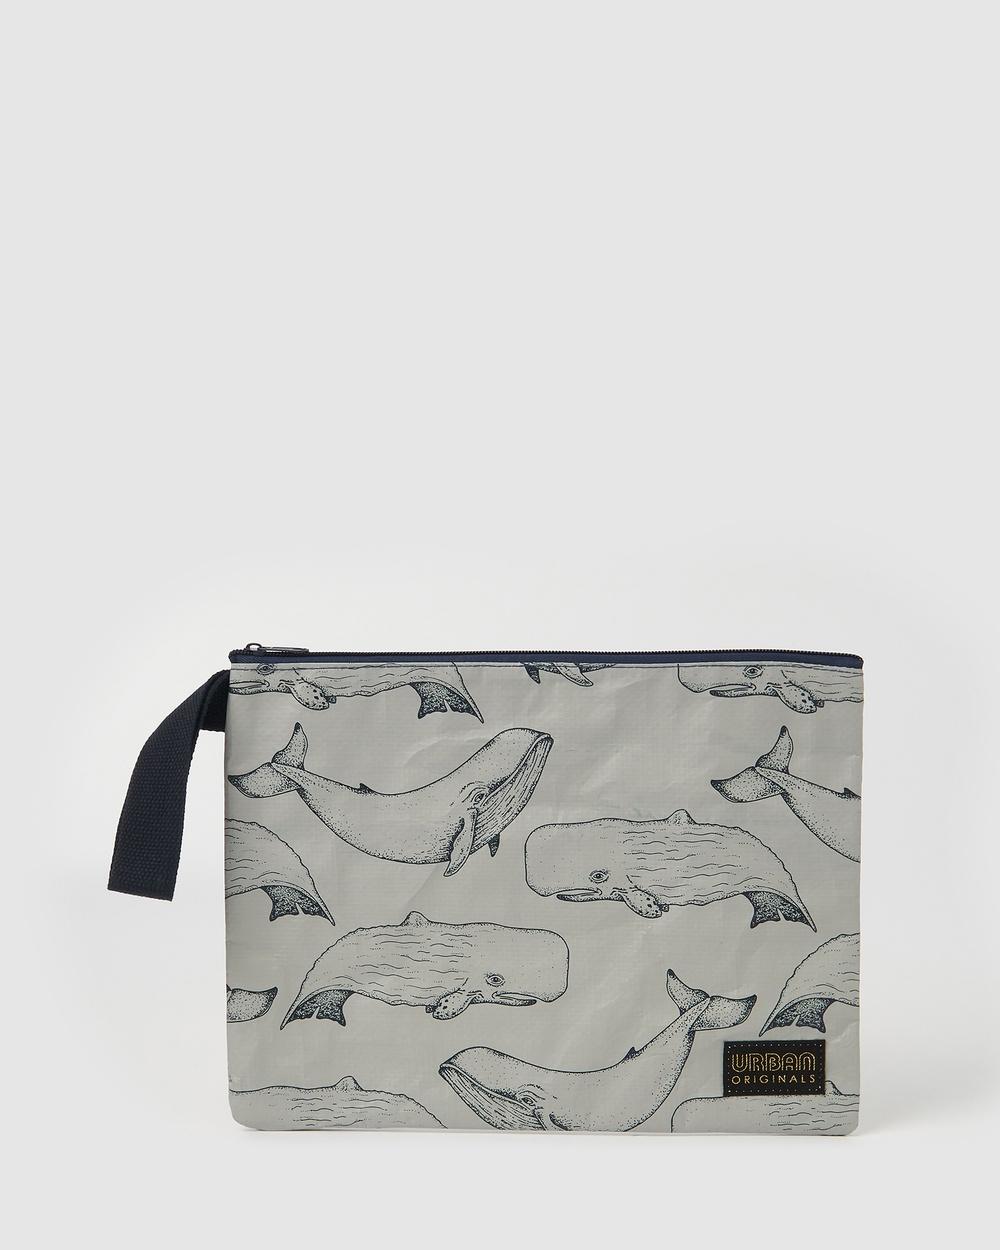 Urban Originals Pouch Clutches Whales